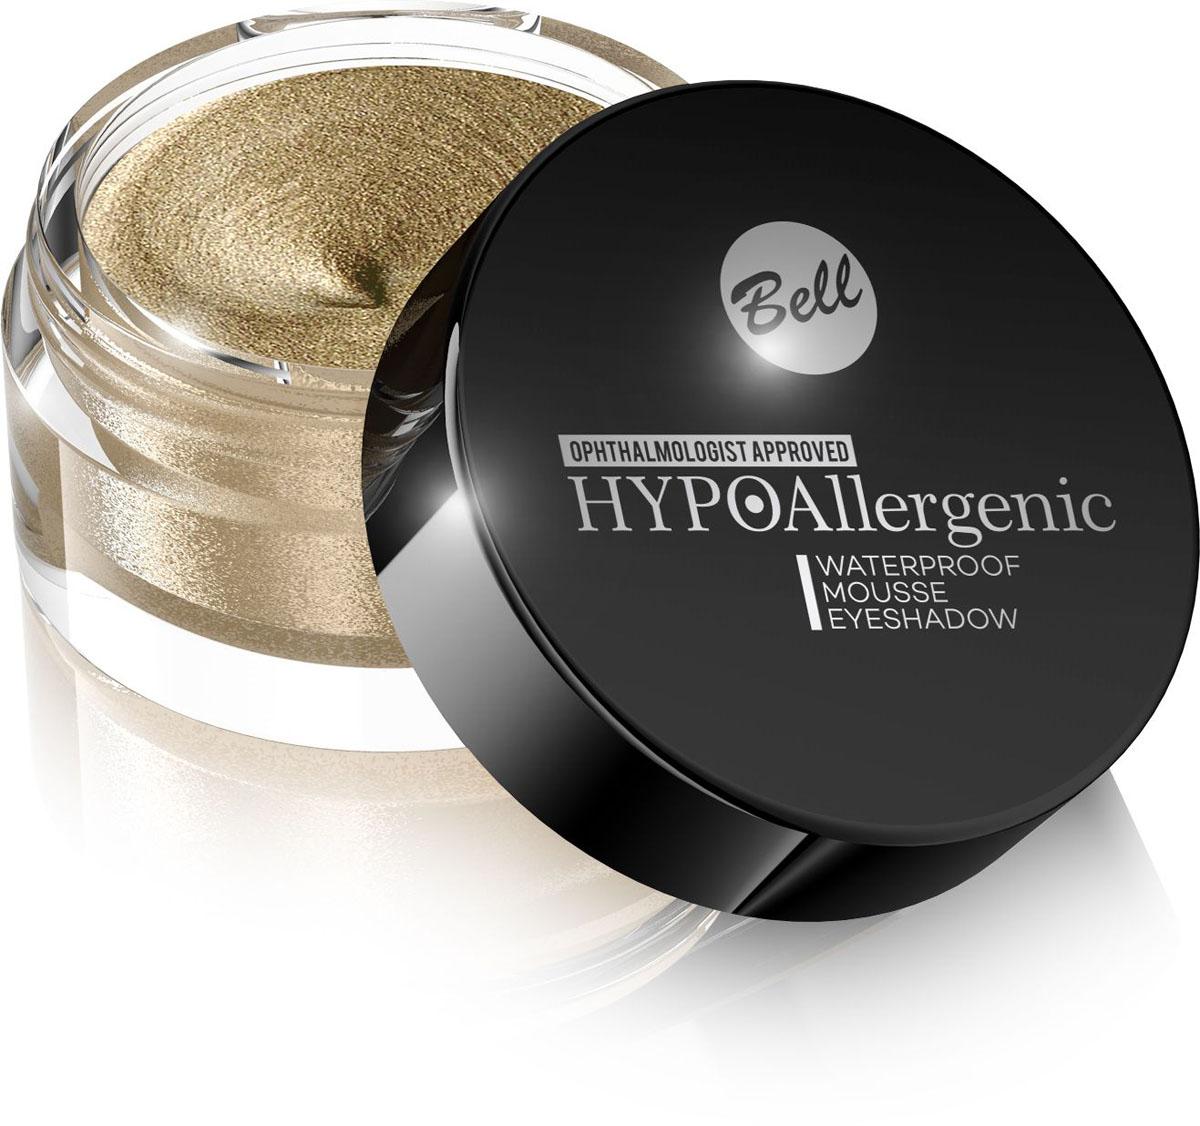 Bell Hypoallergenic Кремовые тени для век Waterproof Mousse Eyeshadow, Тон №02, 23 млBcmHA002